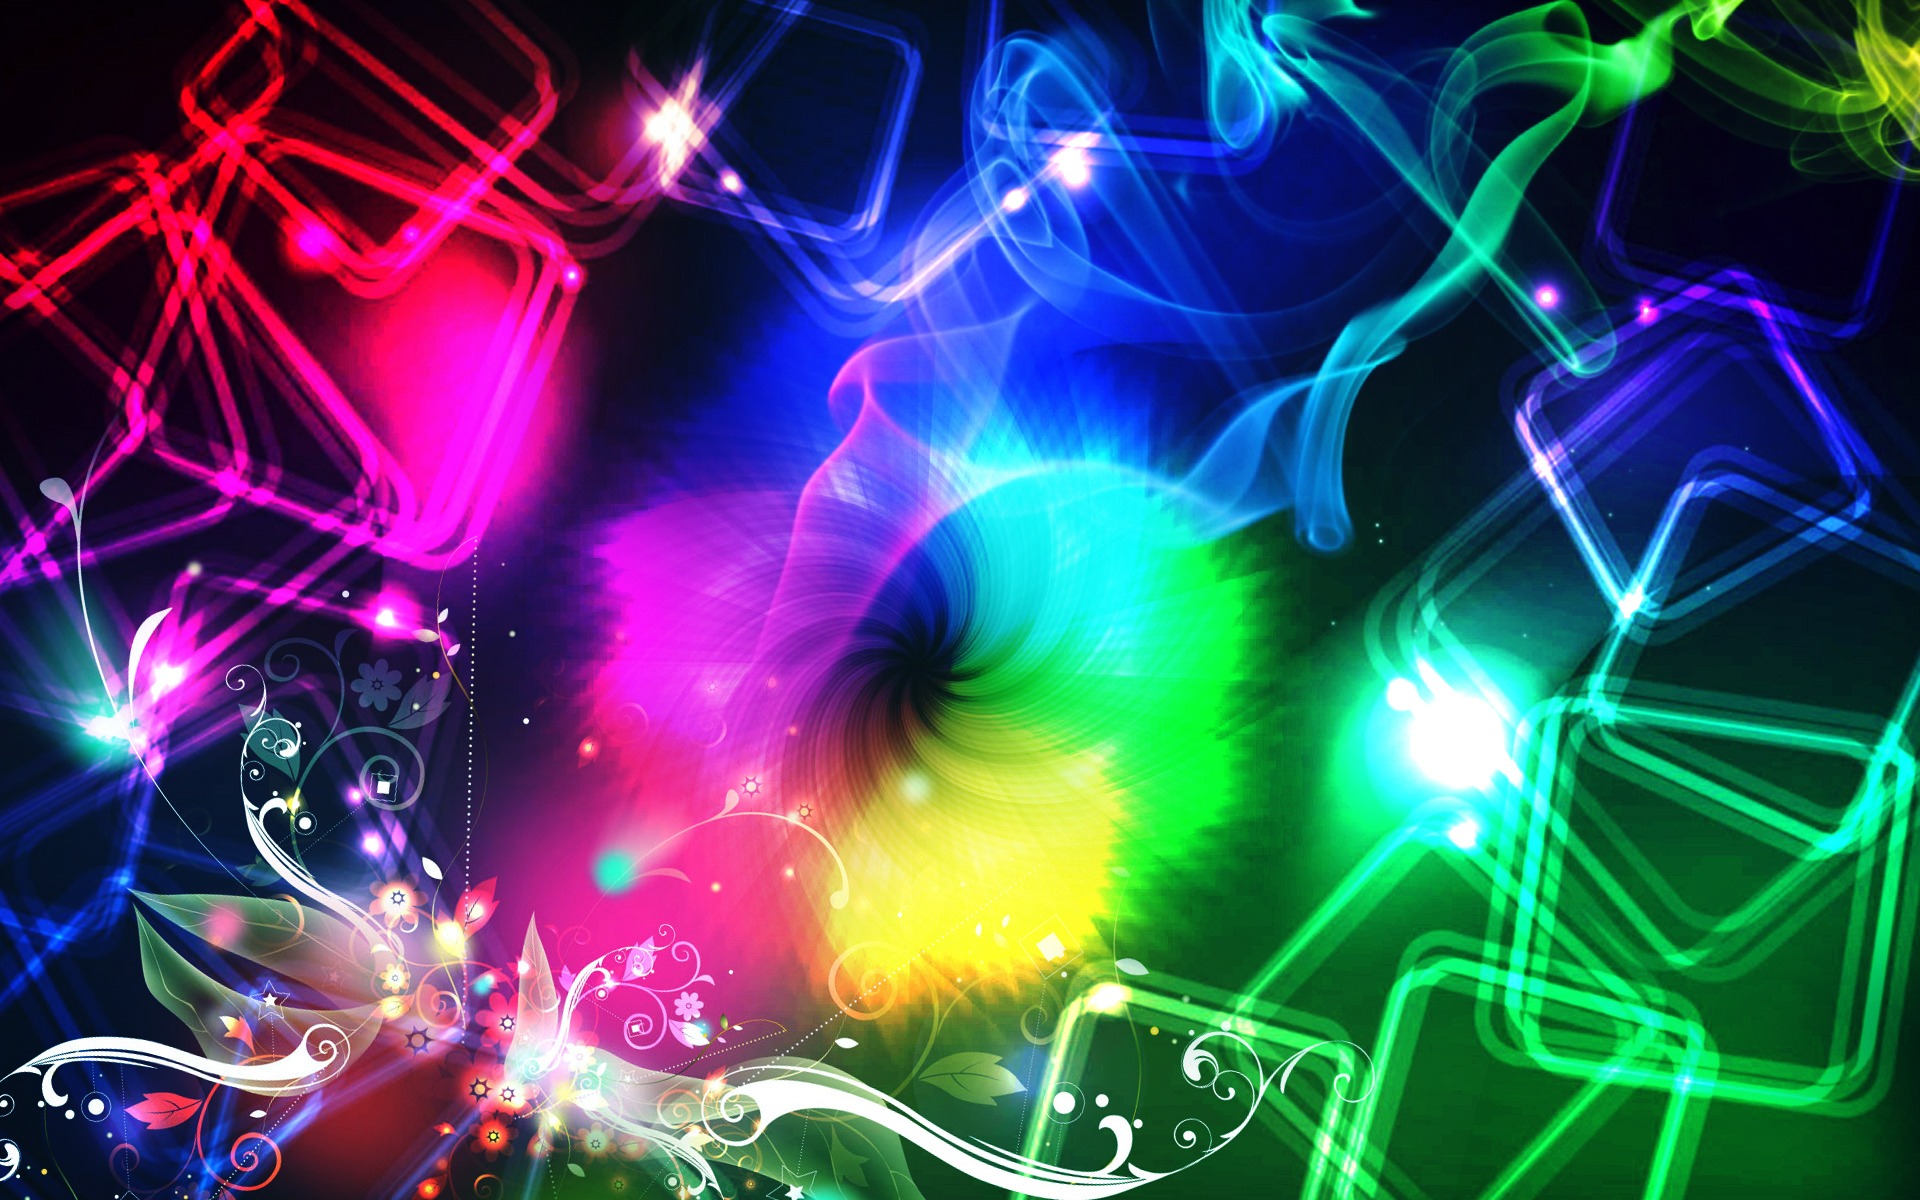 Colorful Wallpaper For Walls E Entertainment 1920x1200